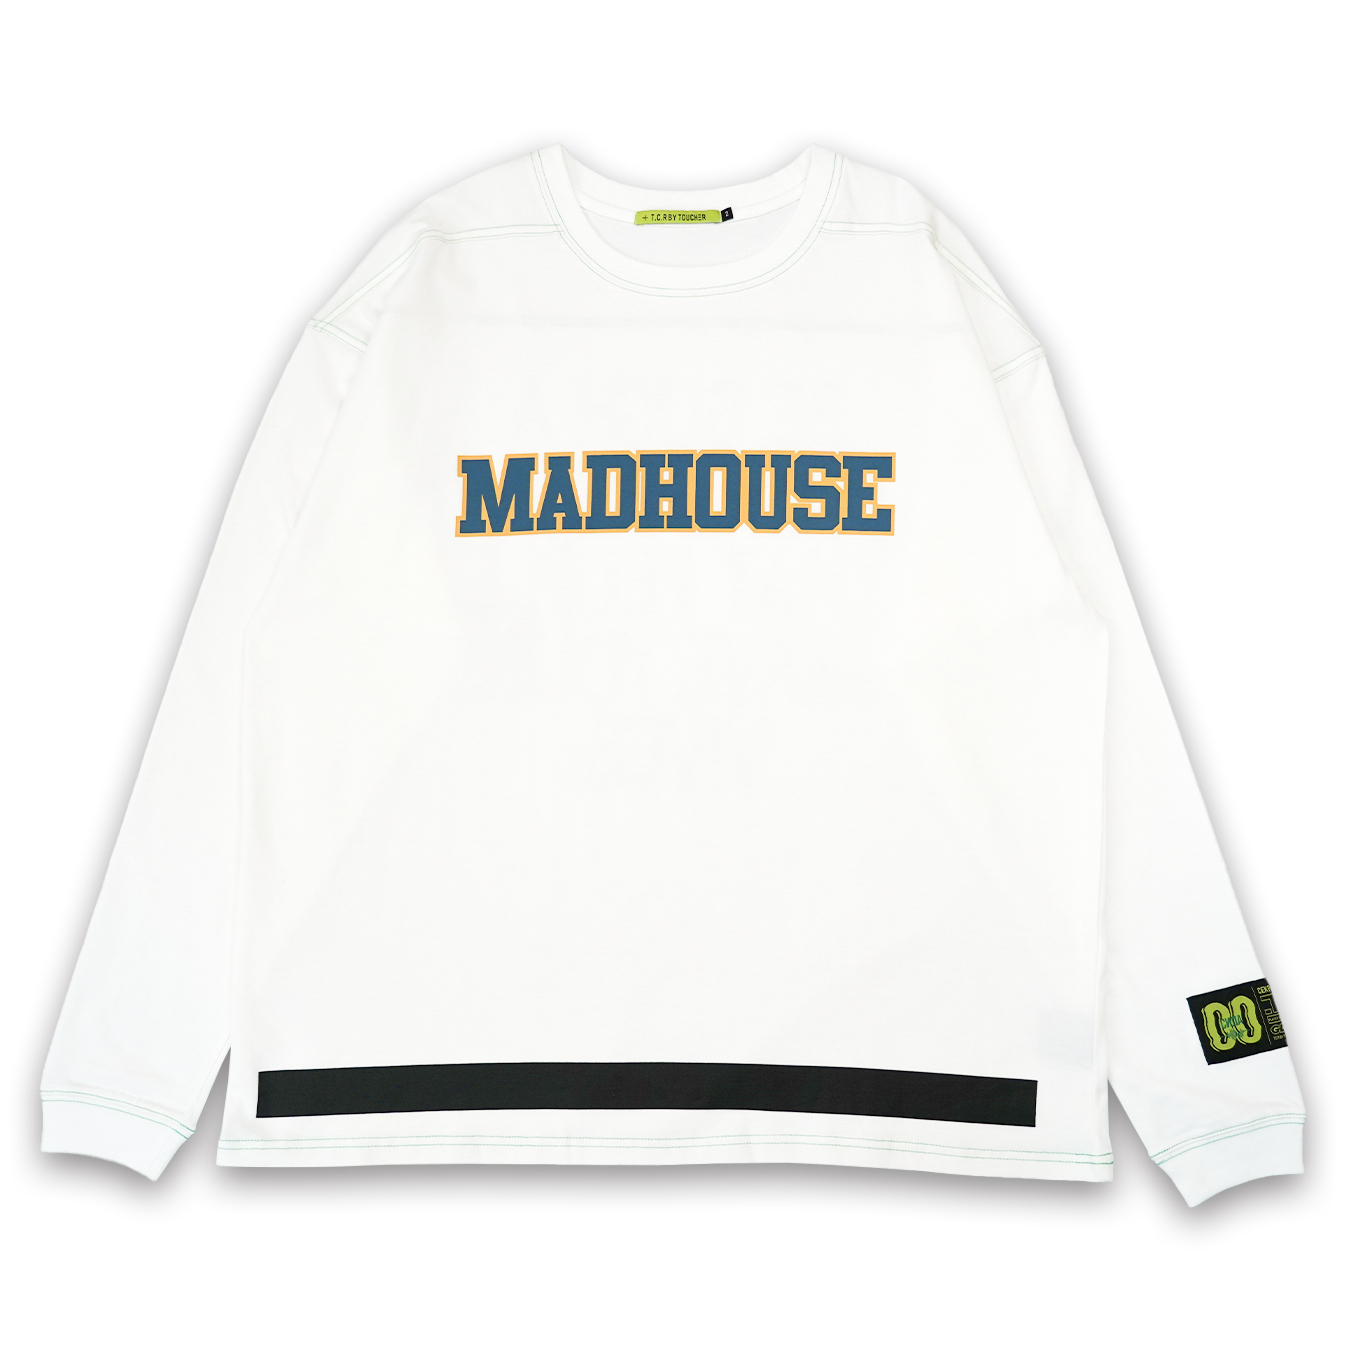 T.C.R MADHOUSE L/S TEE - WHITE